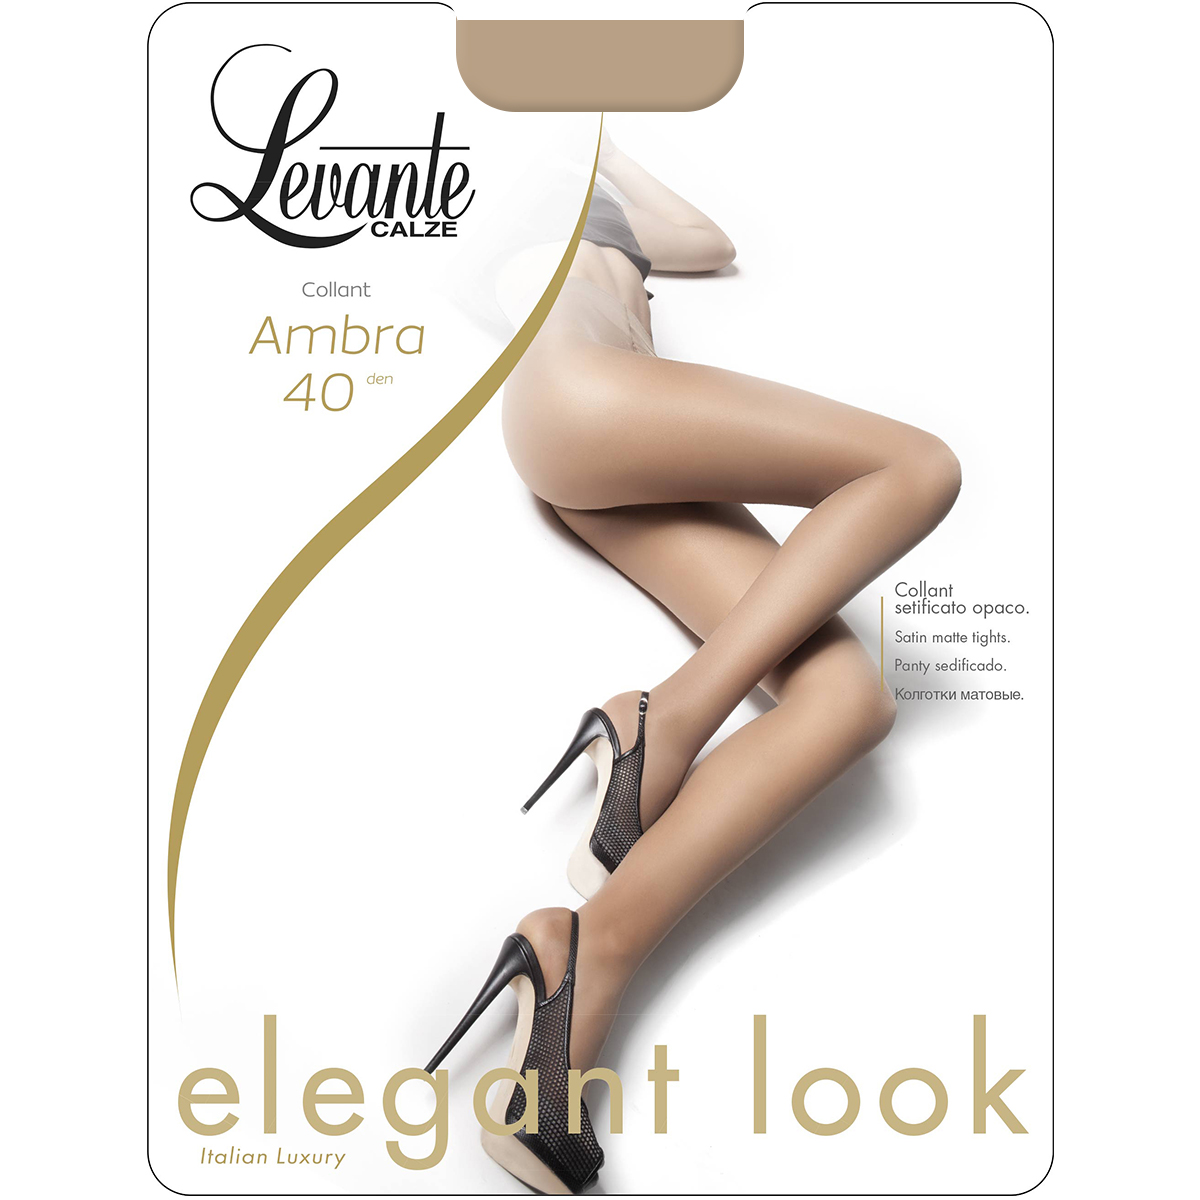 https://golden-legs.com.ua/images/stories/virtuemart/product/Ambra_40den.jpg